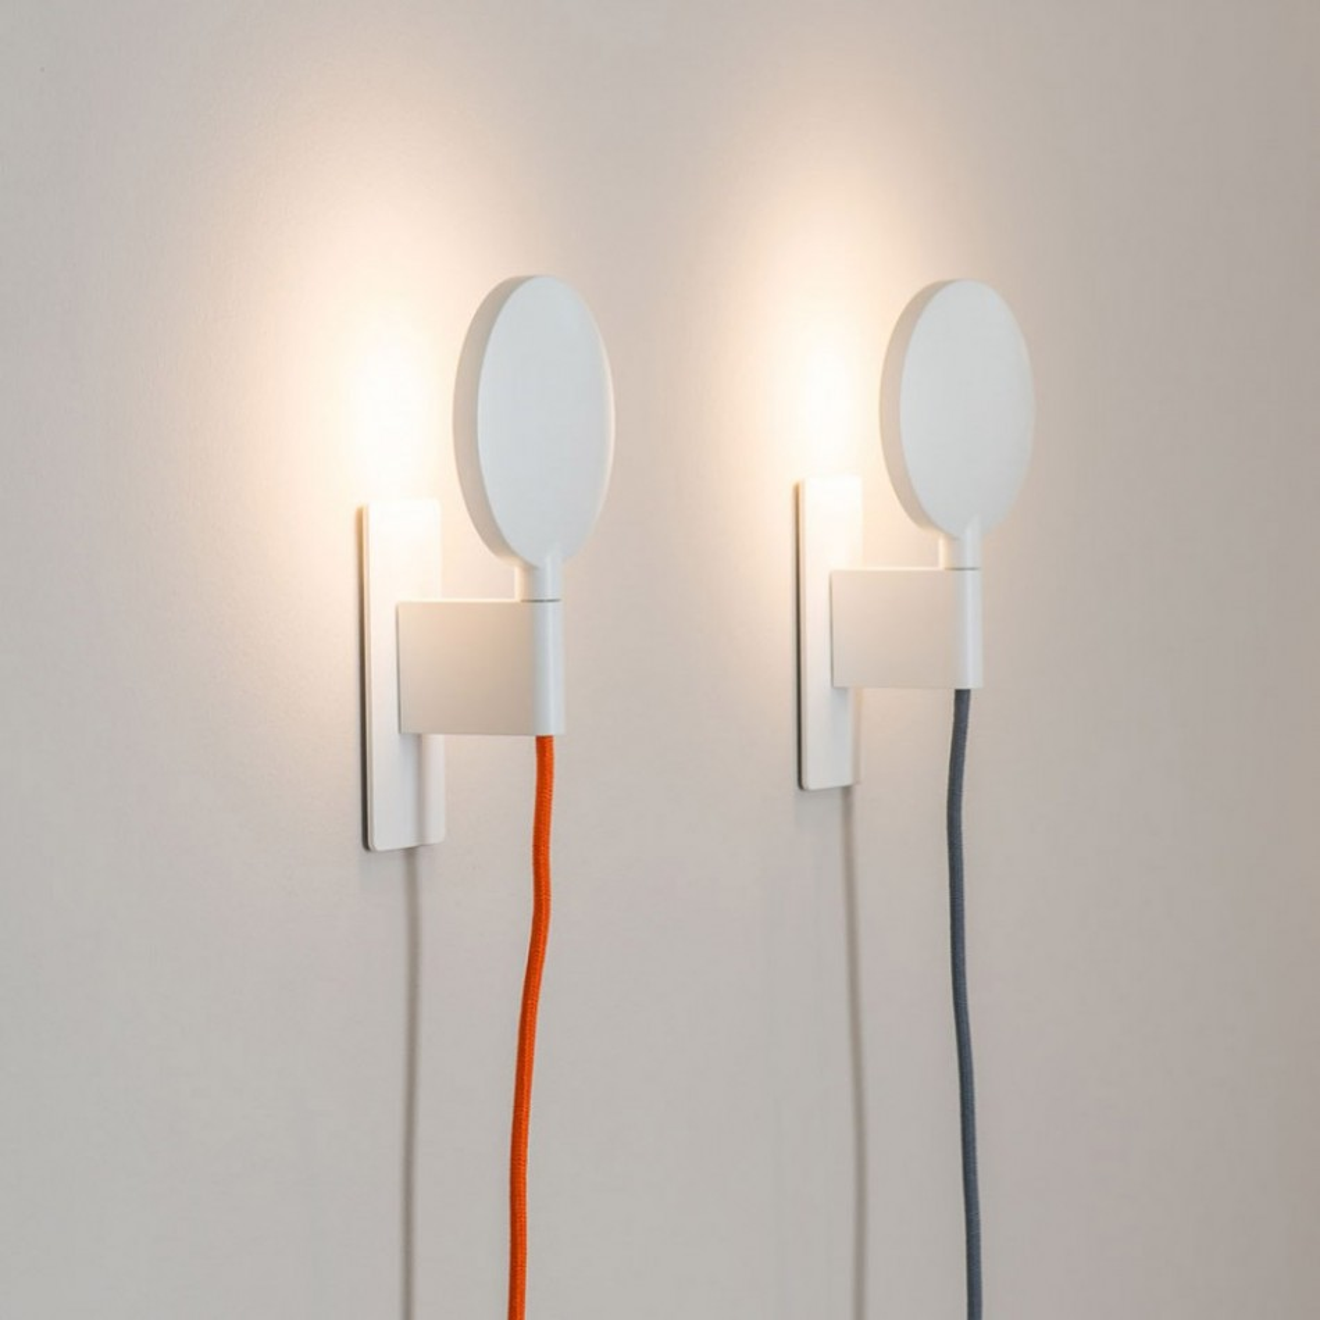 Mawa design wall lamp magnet light maggy green parisarafo Gallery